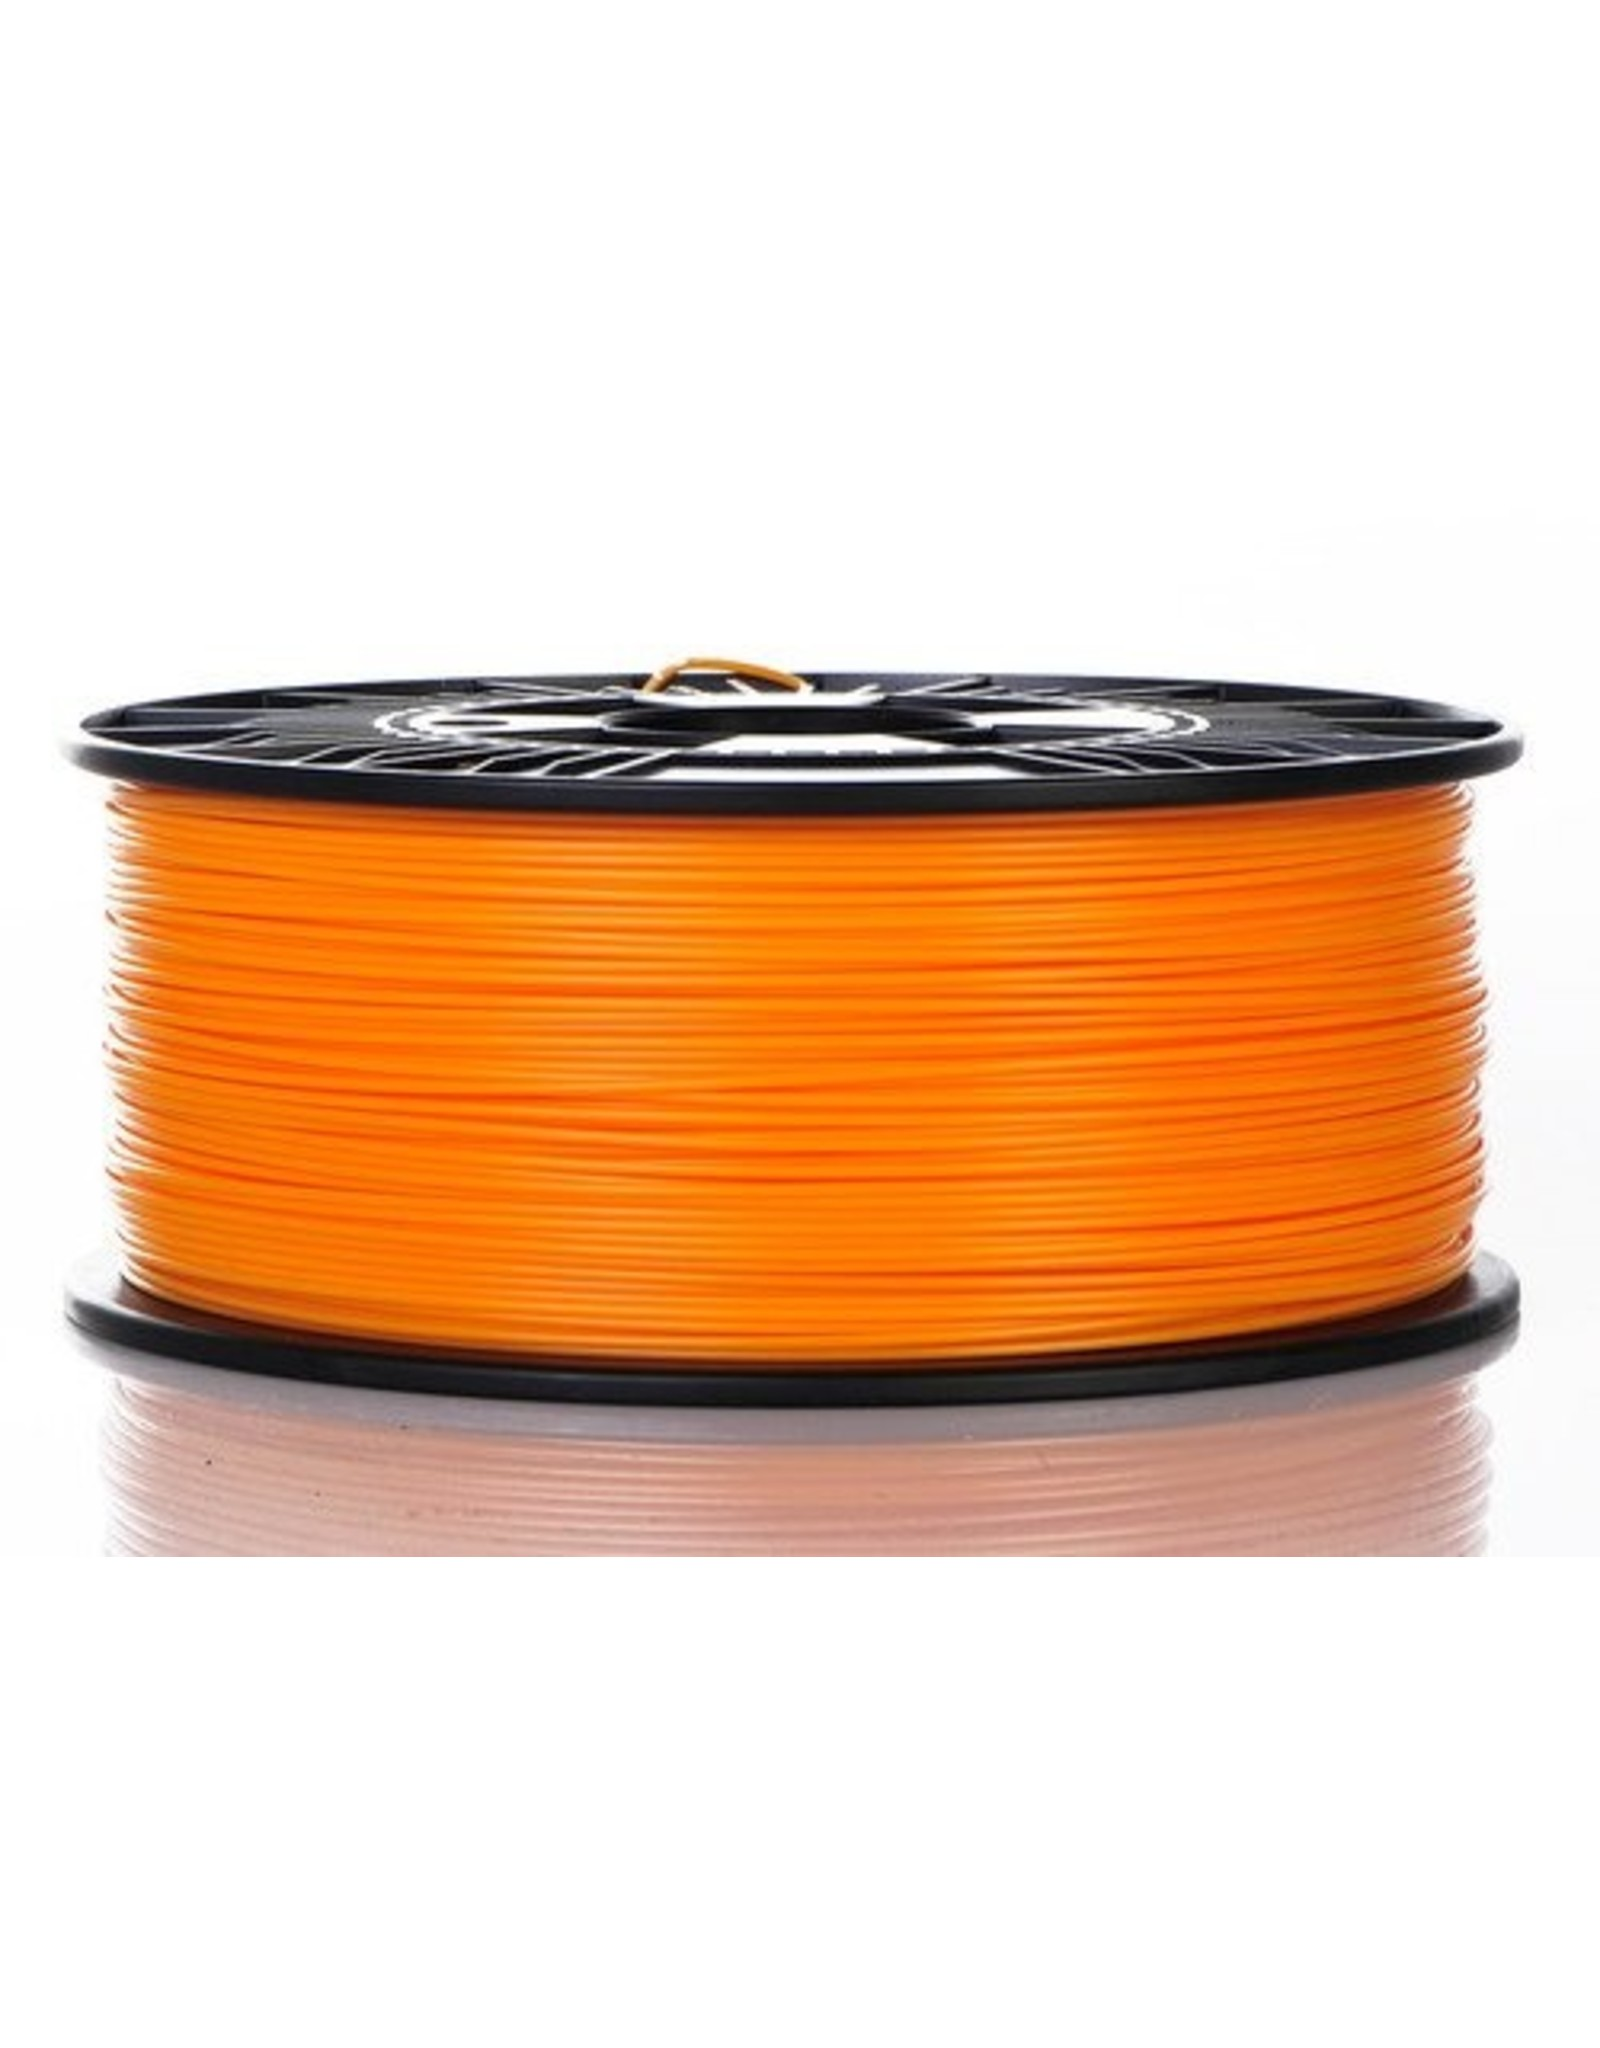 Material4Print PLA 1.75mm Orange 1kg